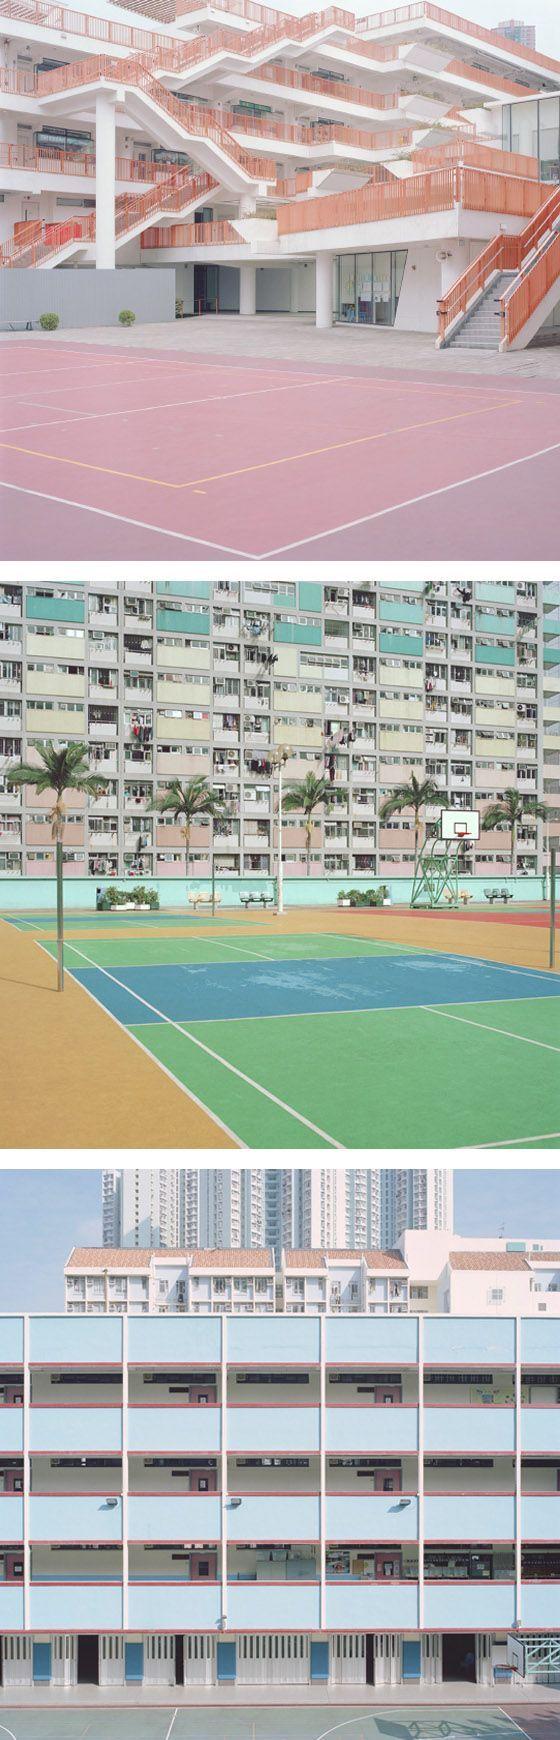 #WardRoberts | Courts. #photography #urbanspace